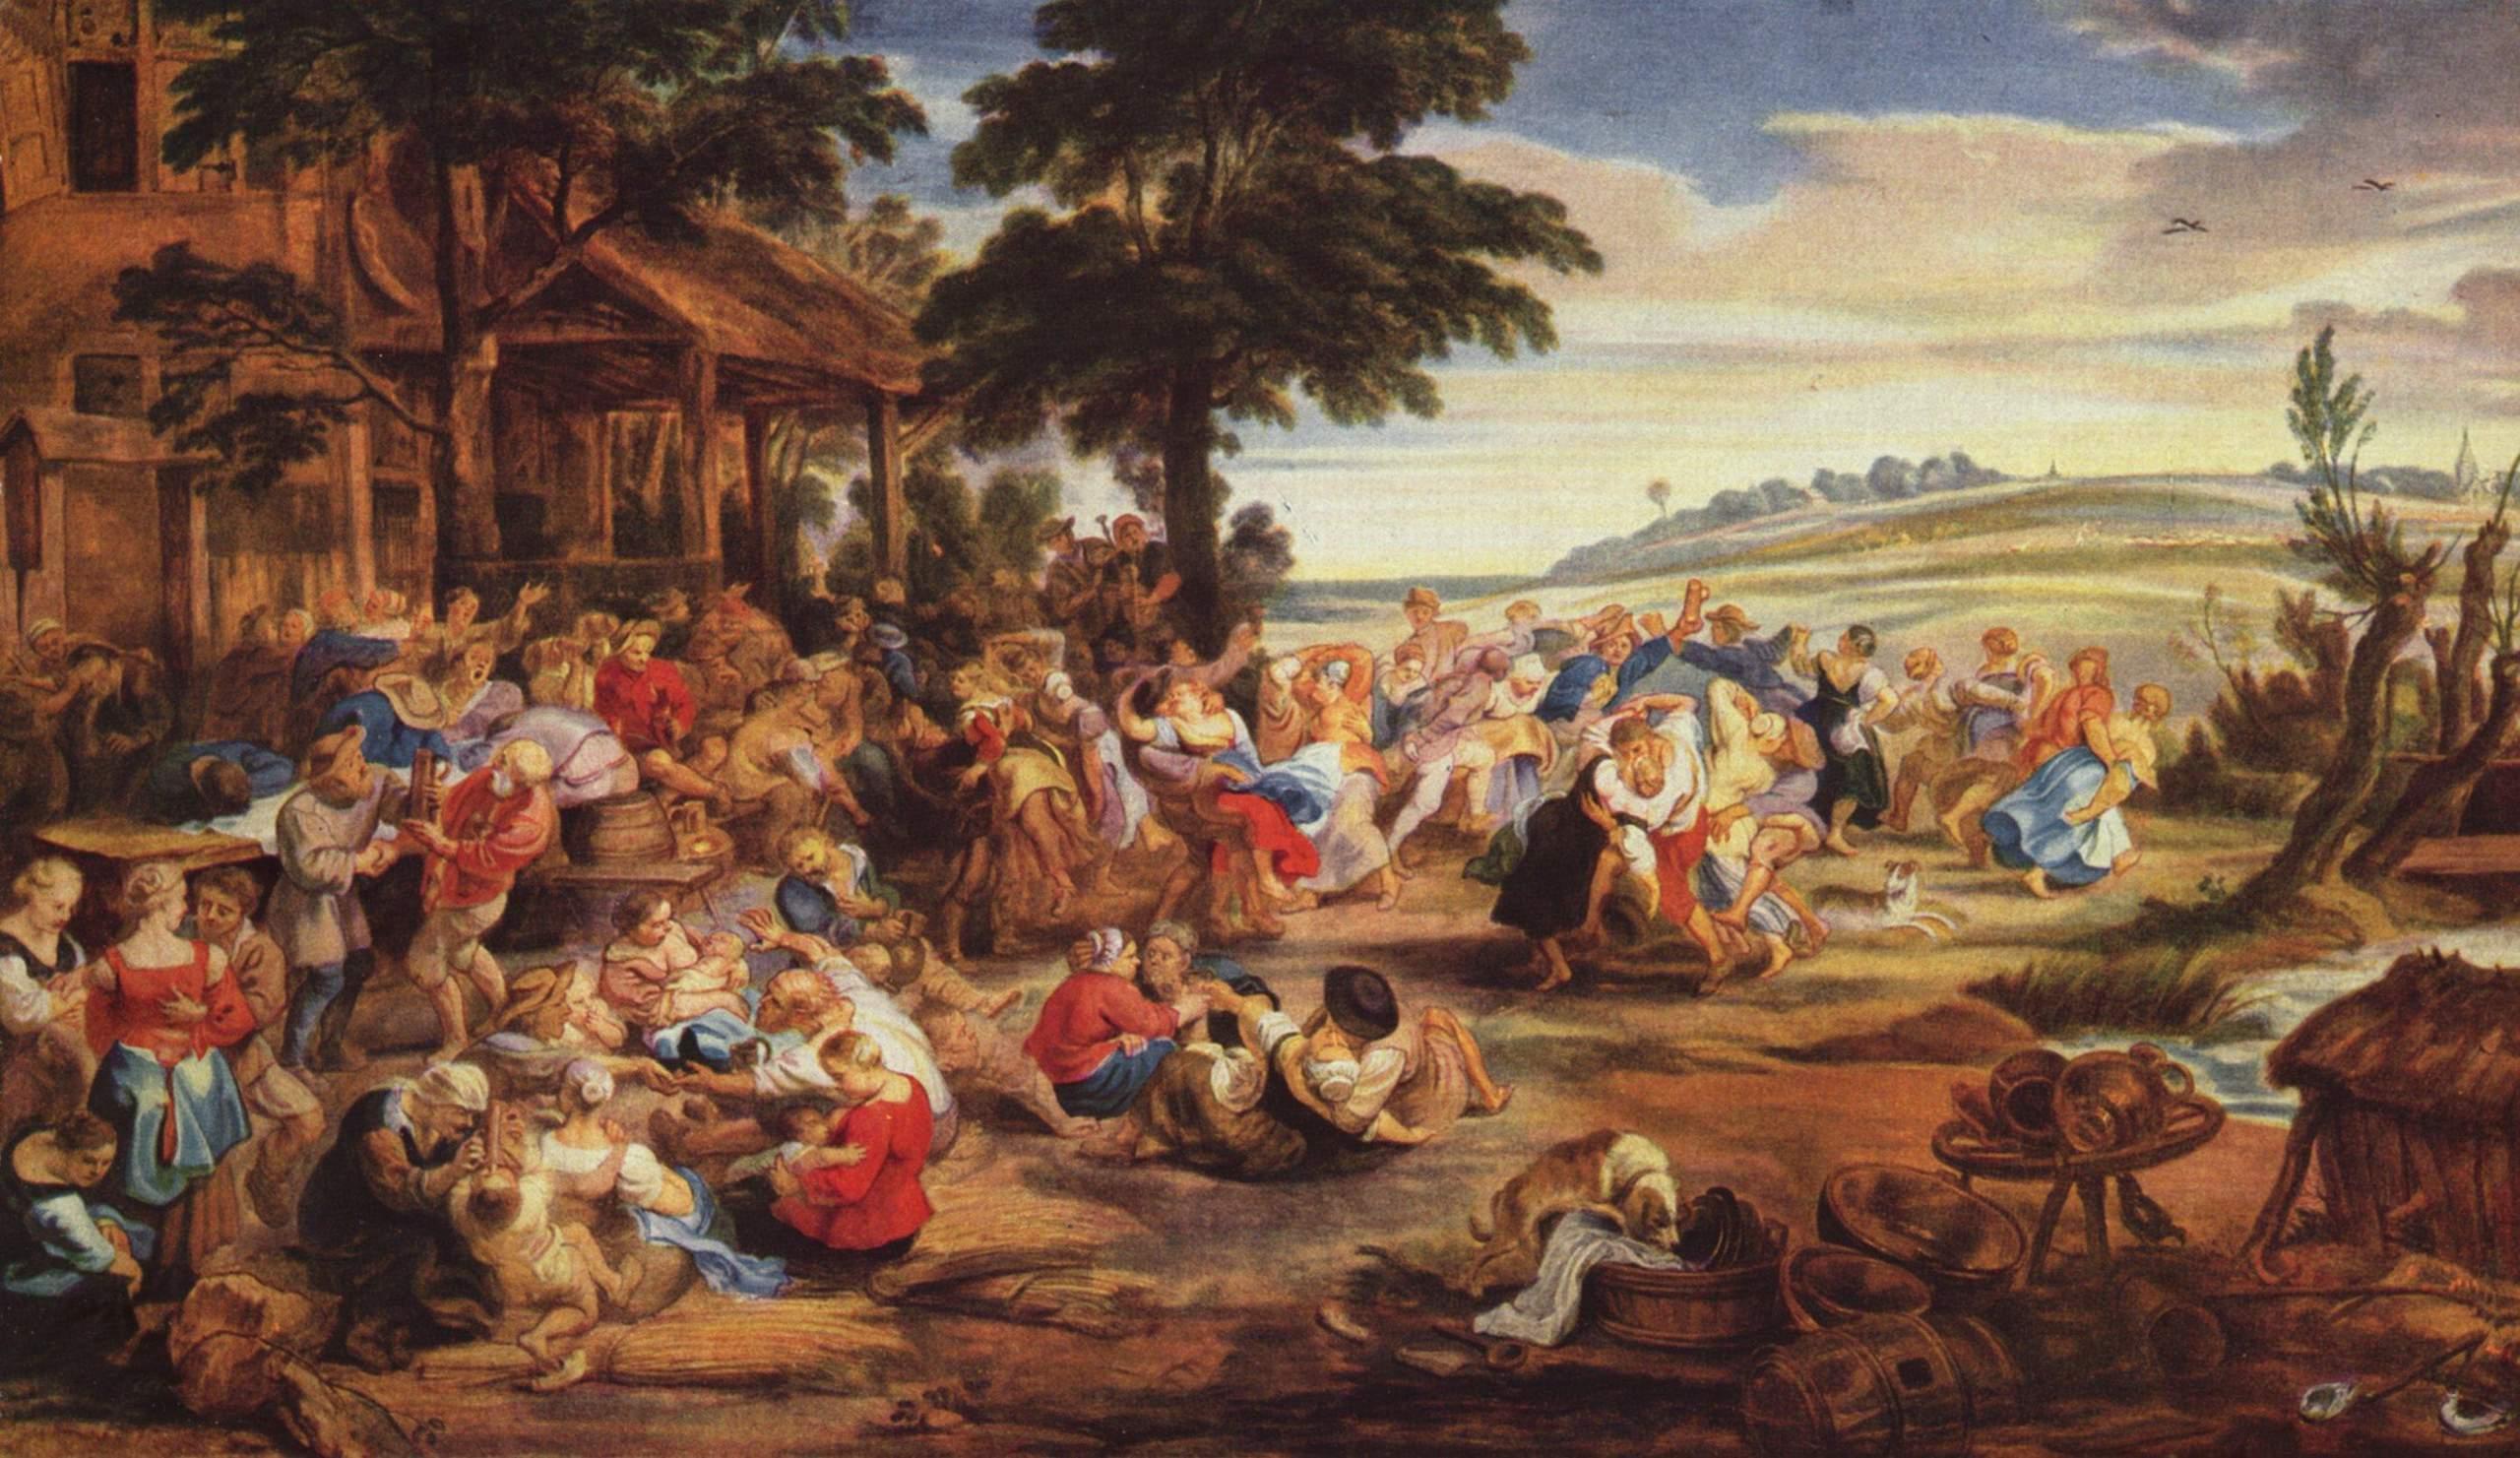 Peter Paul Rubens (1577-1640), The Fair, around 1635Museé du Louvre, Paris